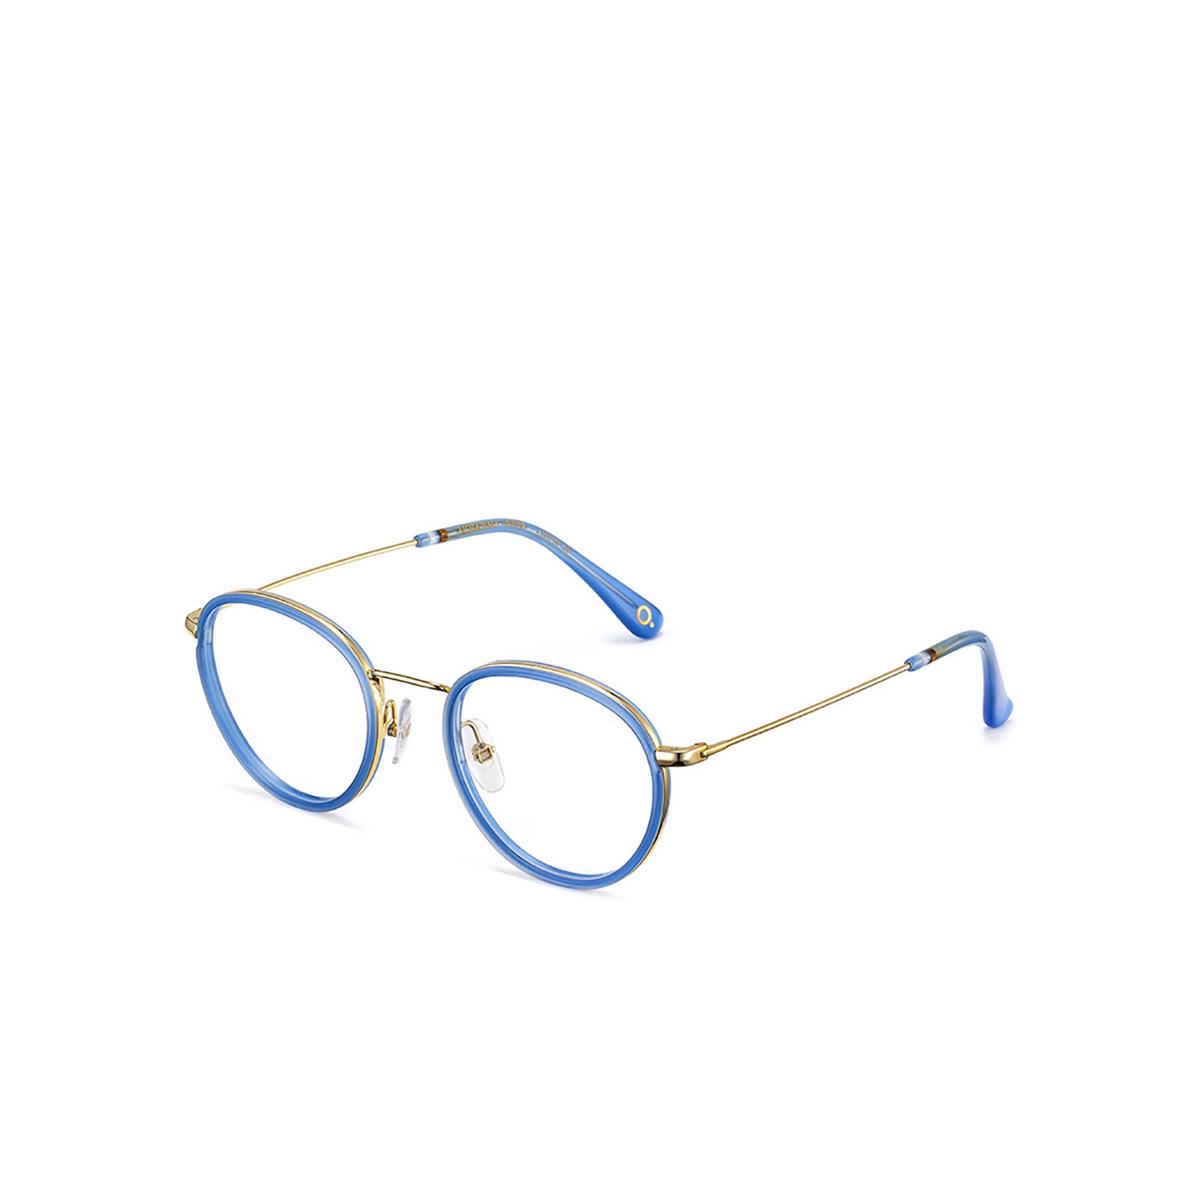 Etnia Barcelona® Round Eyeglasses: Little Italy color Gdbl - three-quarters view.